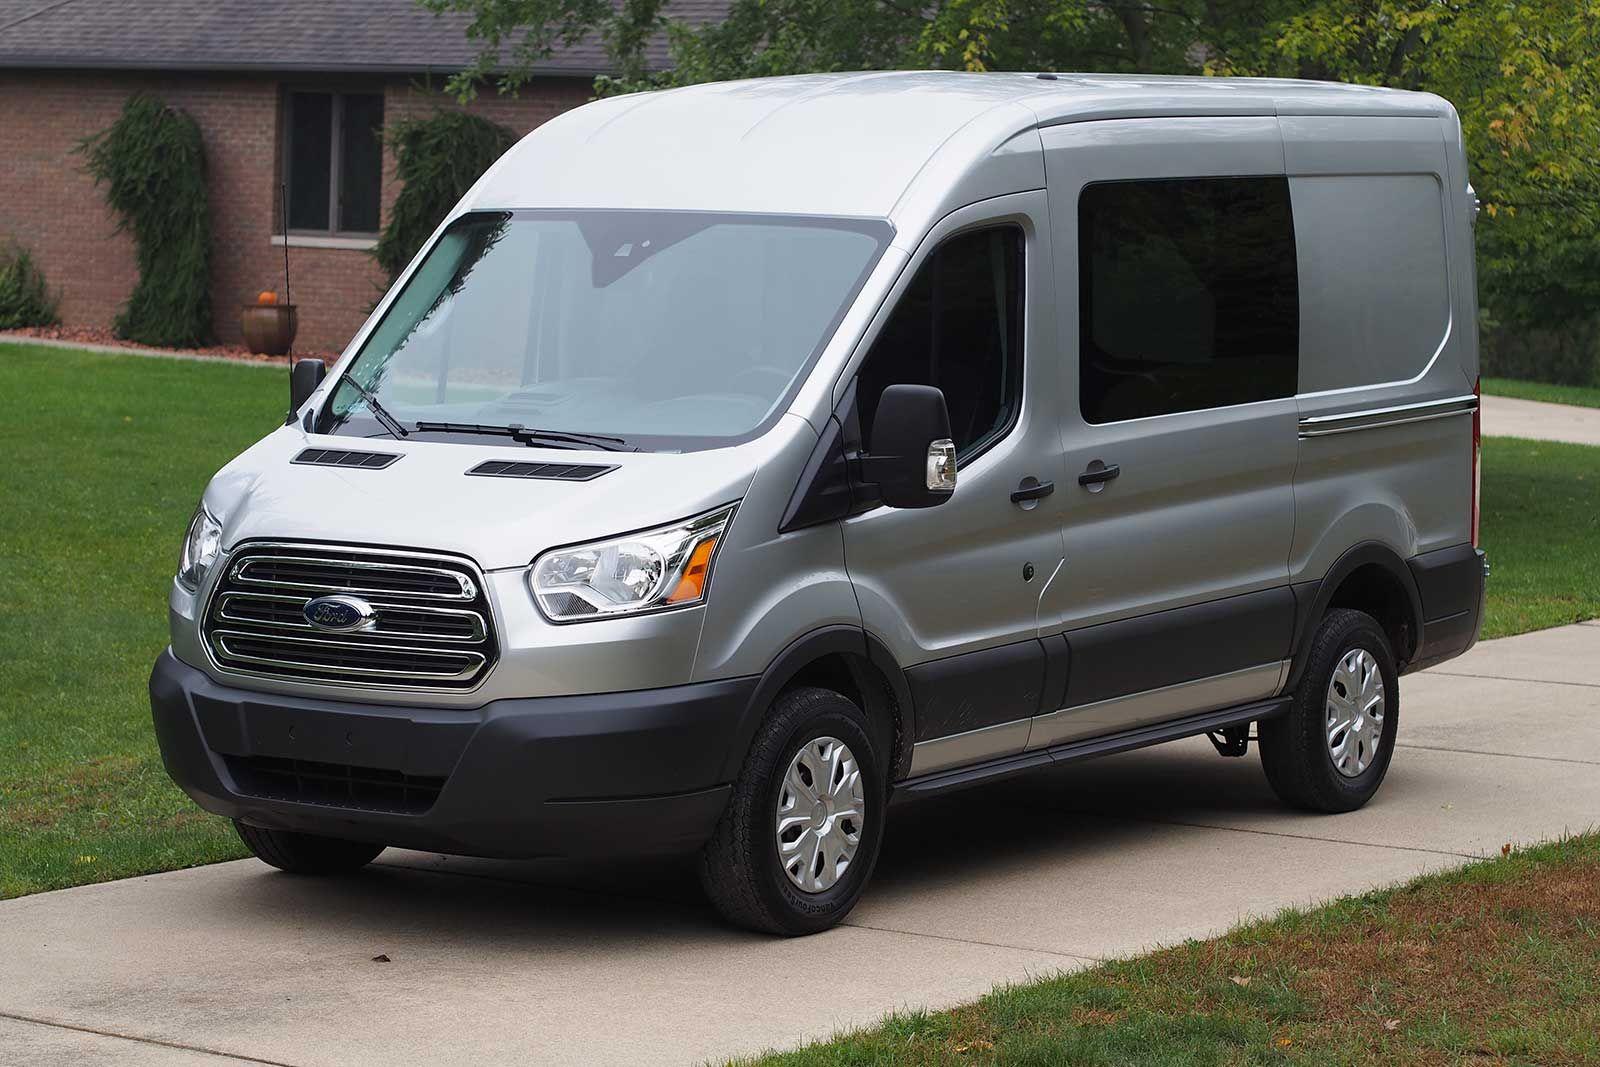 2016 Ford Transit 250 Medium Roof Van Ford Transit Van Engines For Sale